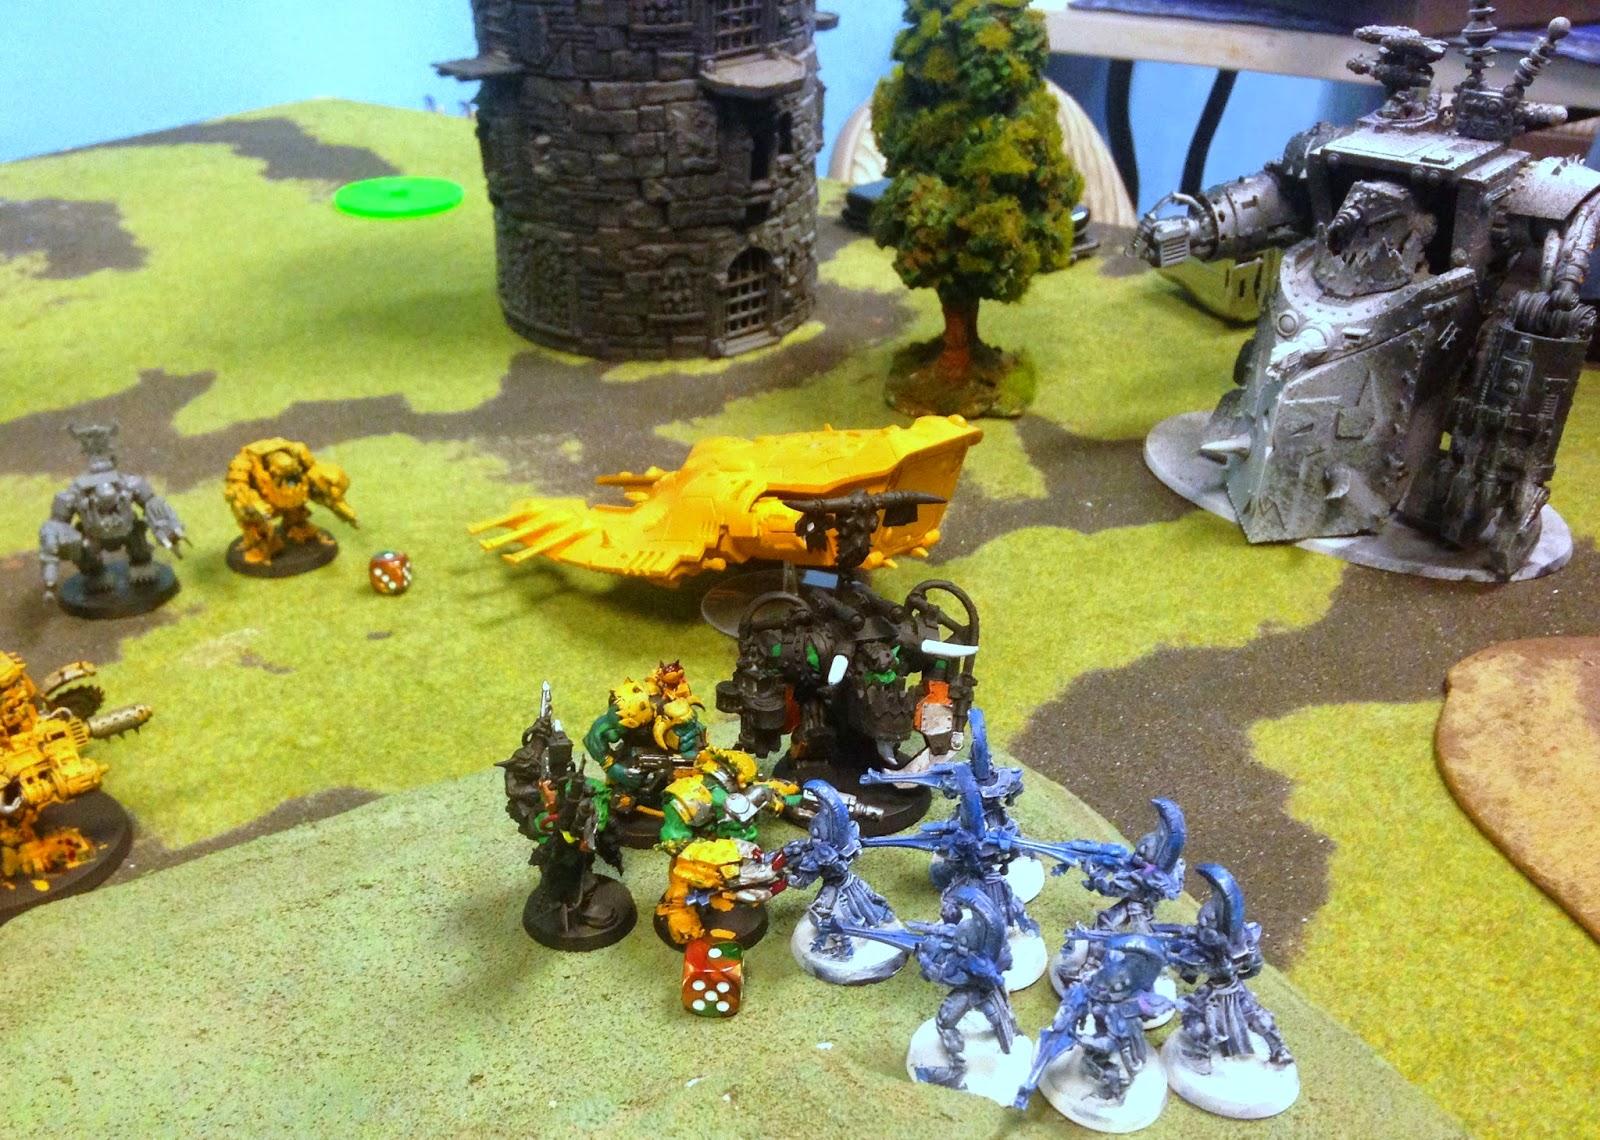 Ghazghkull Thraka in close combat, Orks fighting Eldar, Warhammer 40K, Battle Gaming One